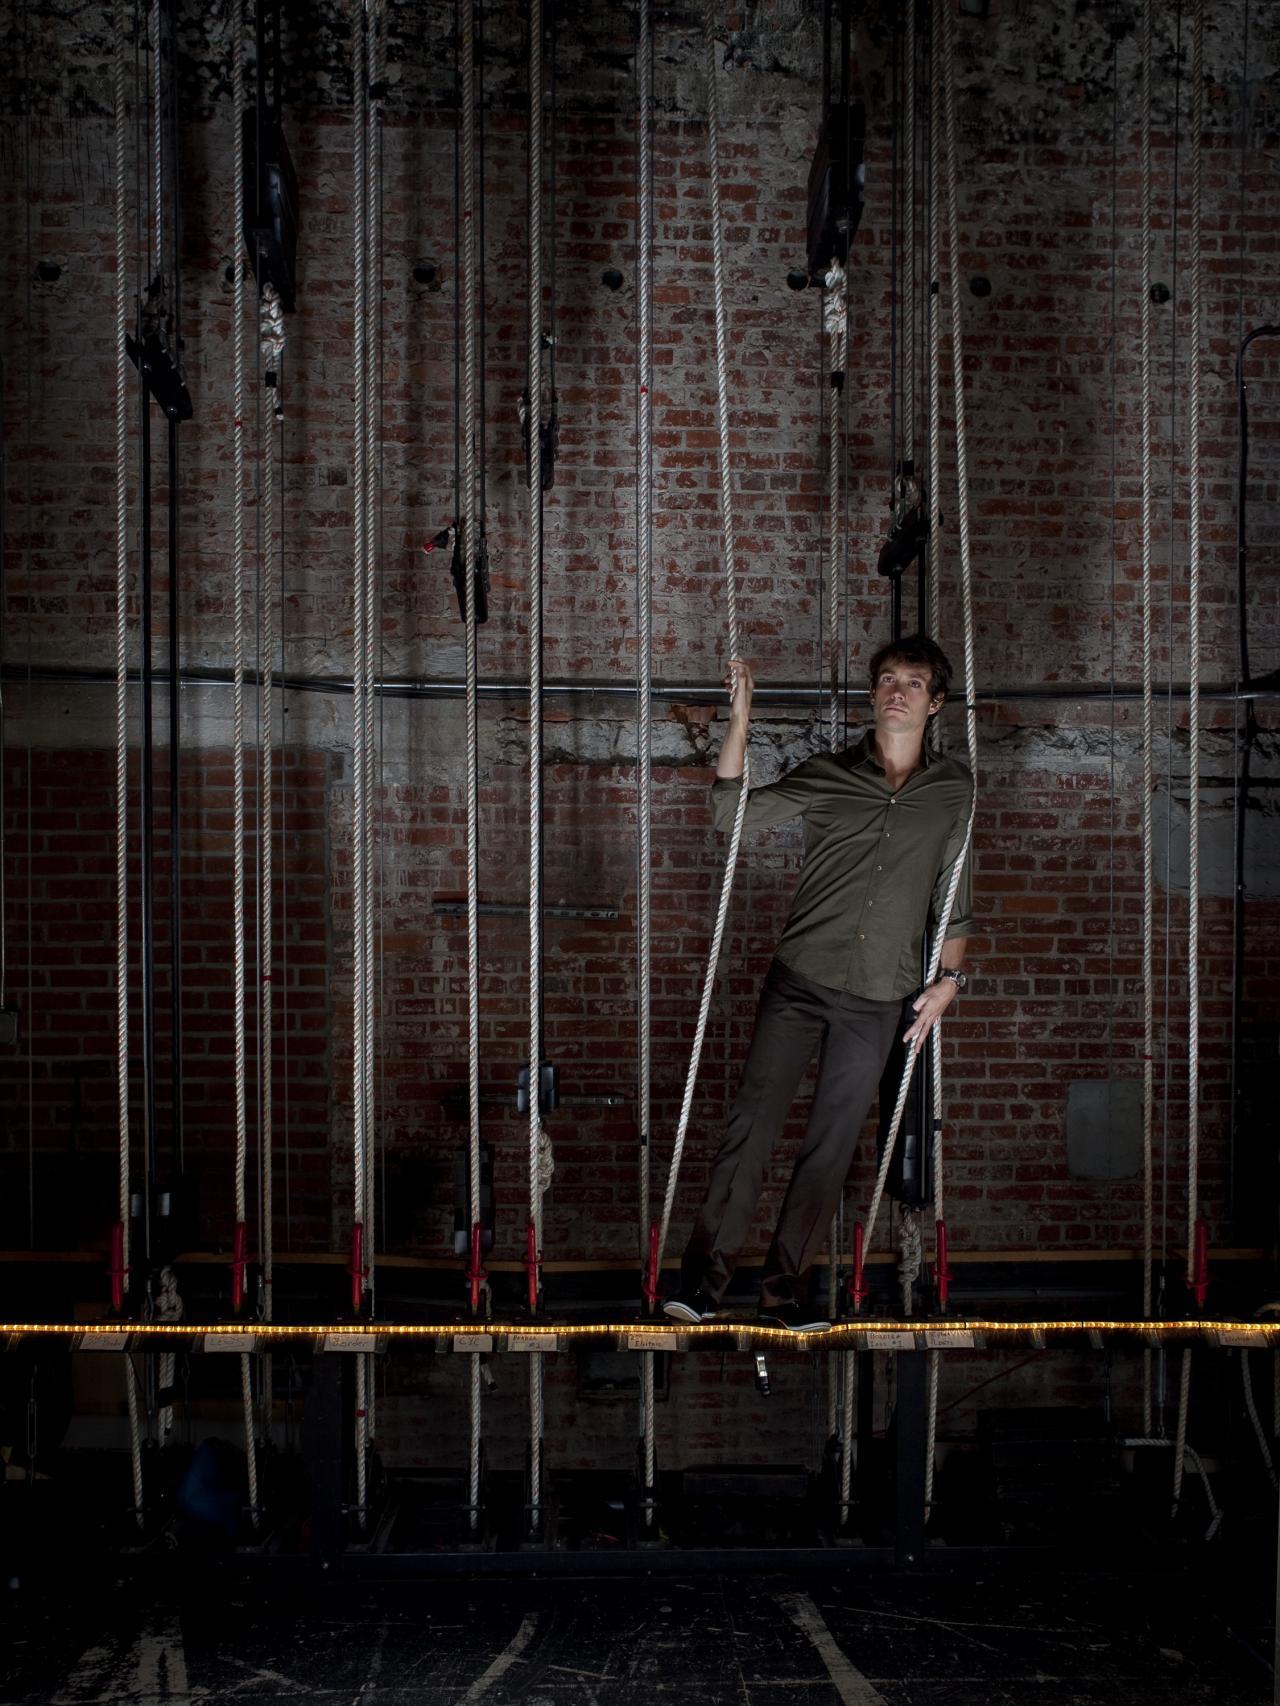 Hugh Dancy Wallpapers High Quality | Download Free